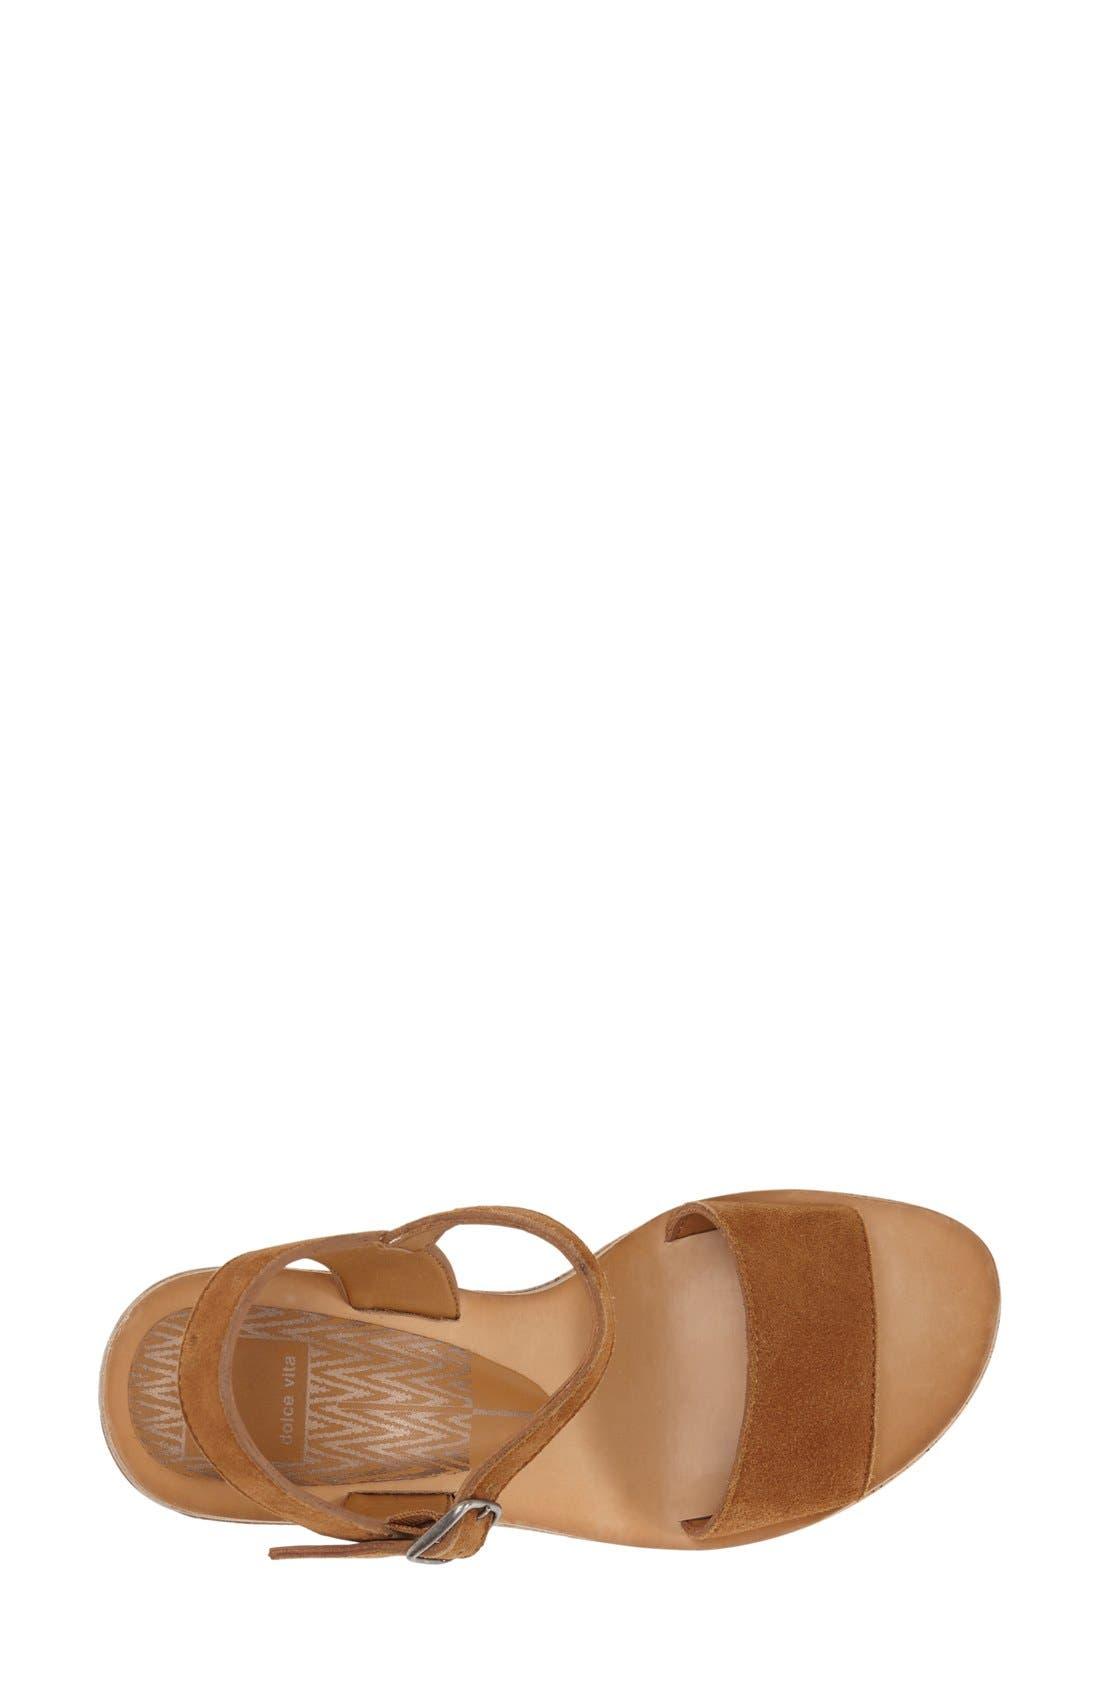 Alternate Image 3  - Dolce Vita 'Randi' Platform Sandal (Women)